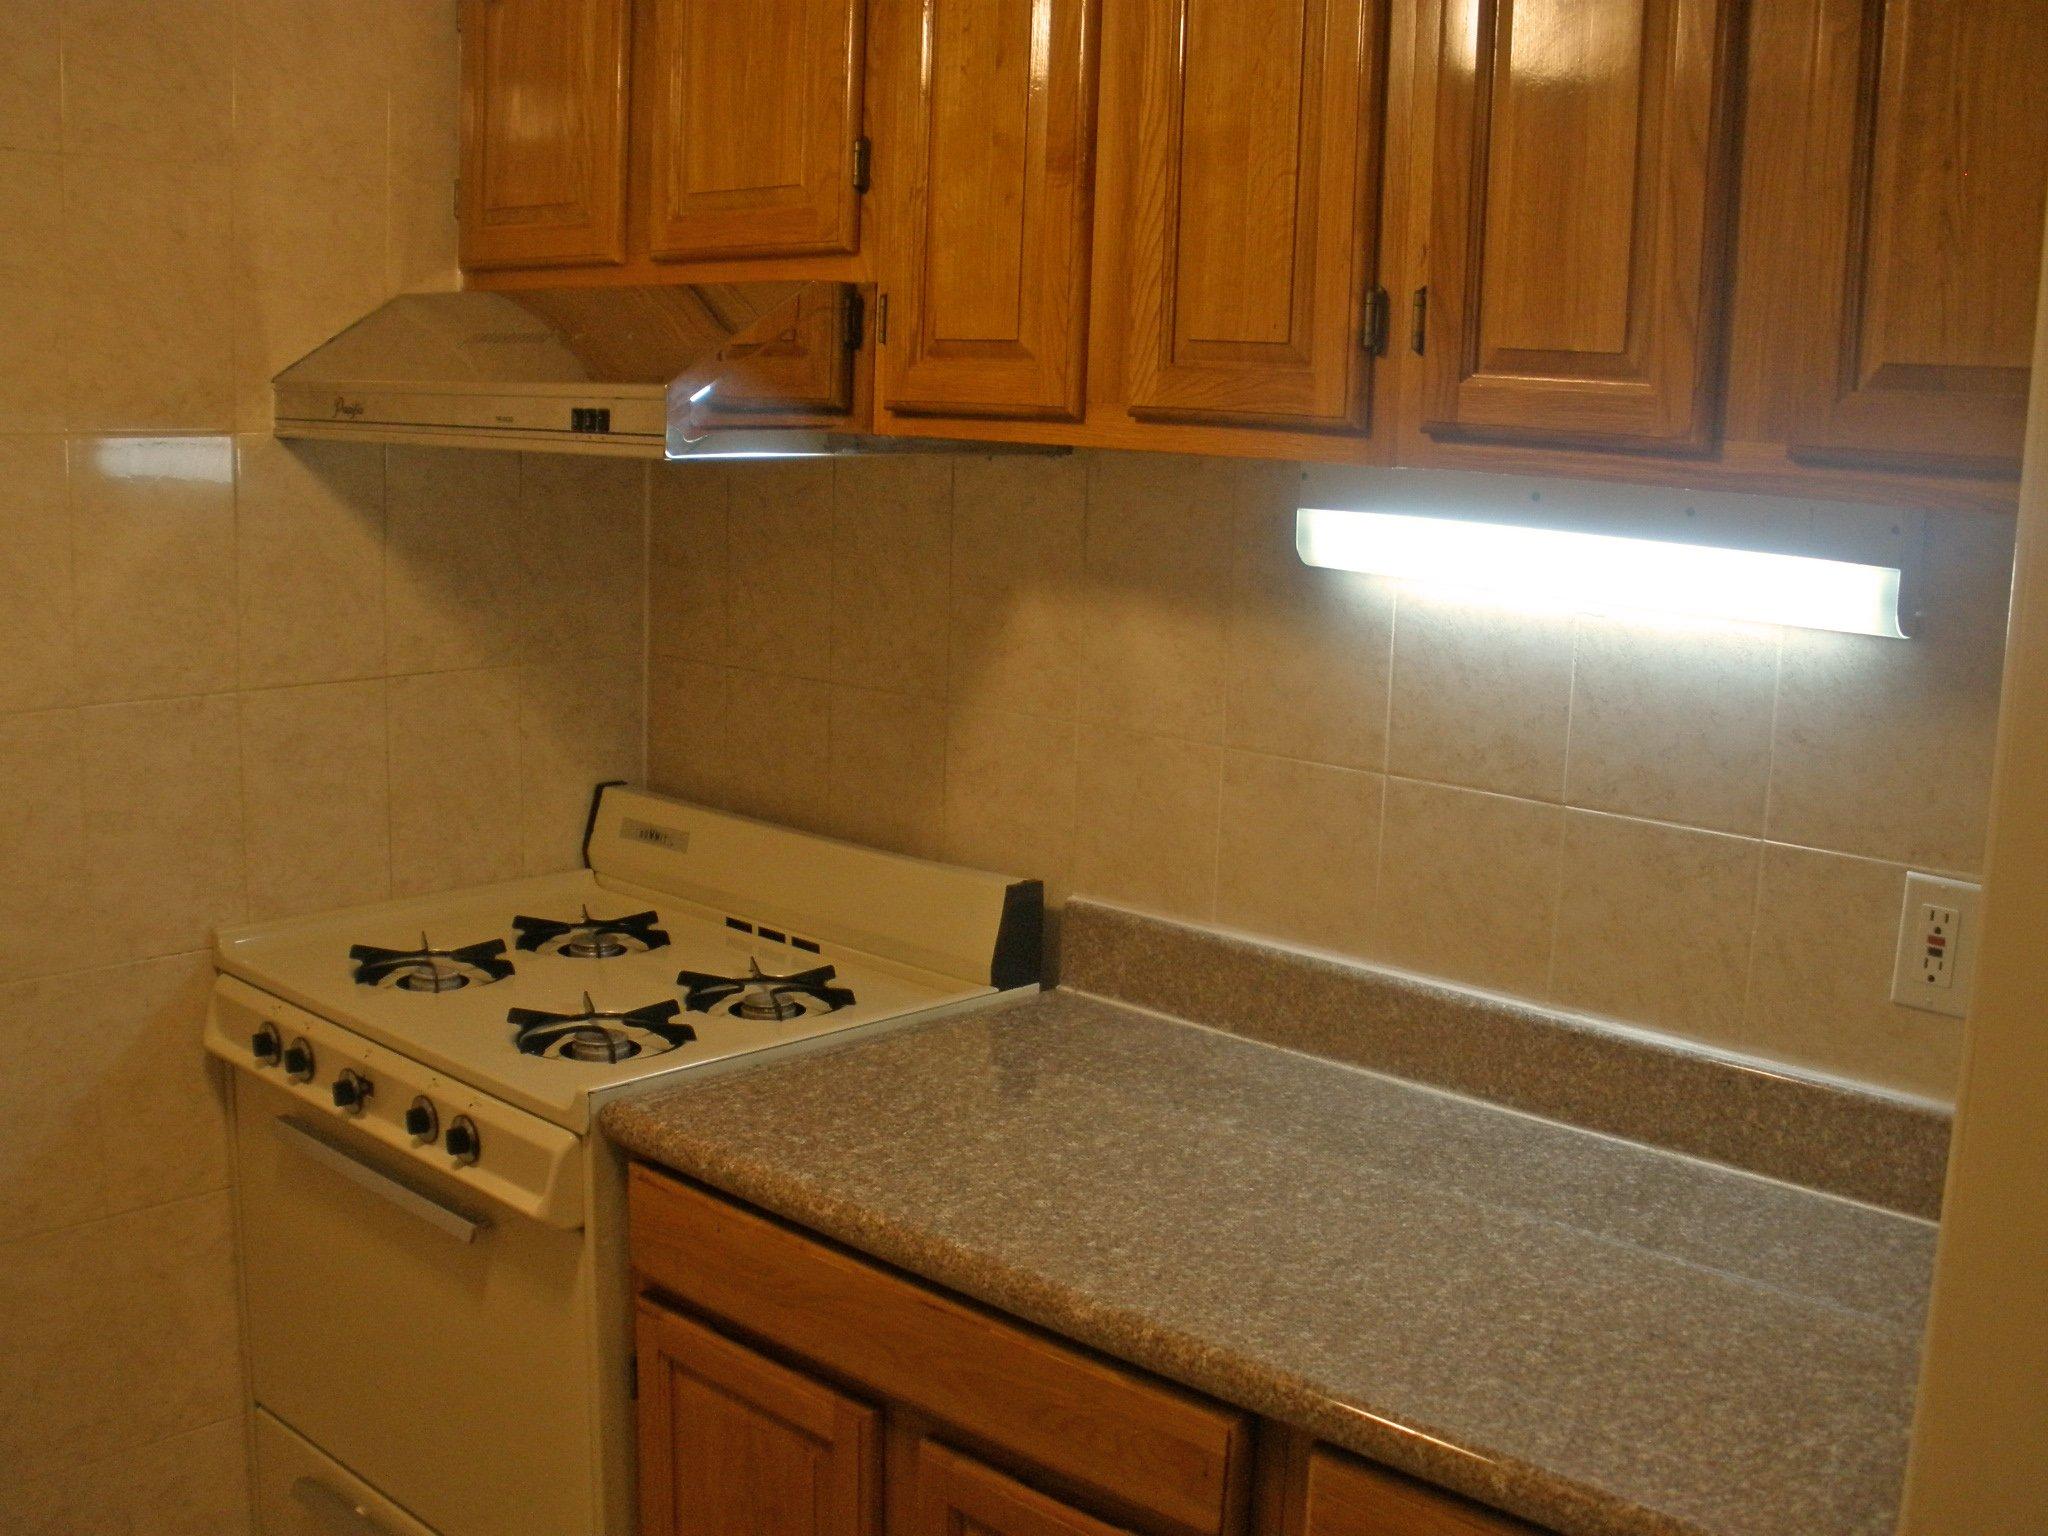 Bedford Stuyvesant 1 Bedroom Apartment For Rent Brooklyn Crg3106